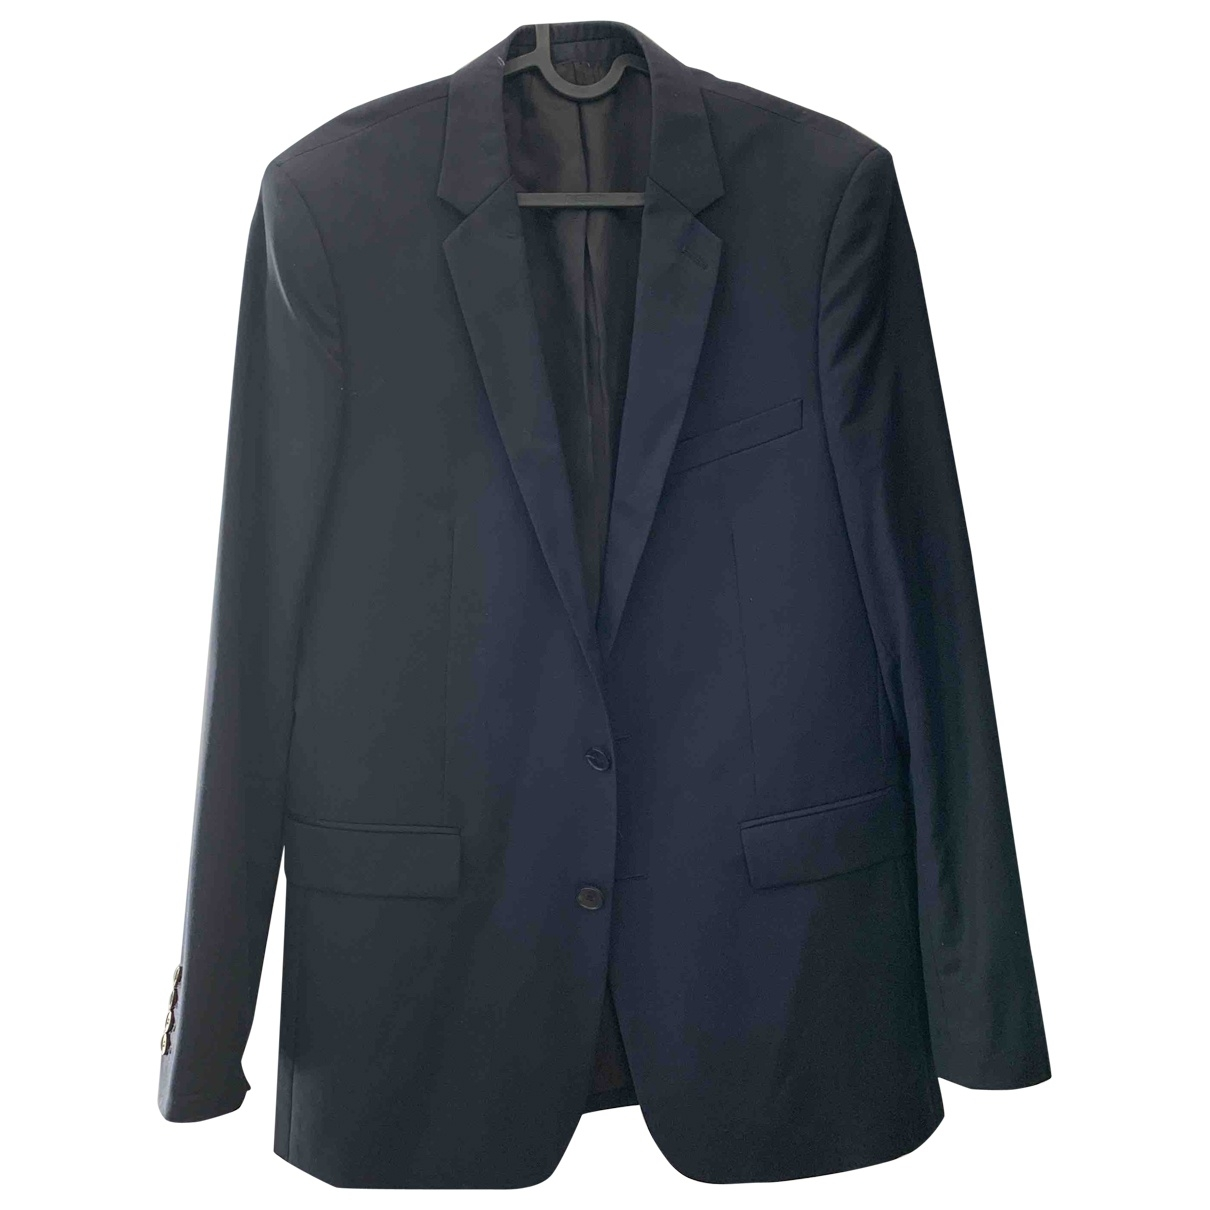 Sandro \N Blue Cotton jacket  for Men M International